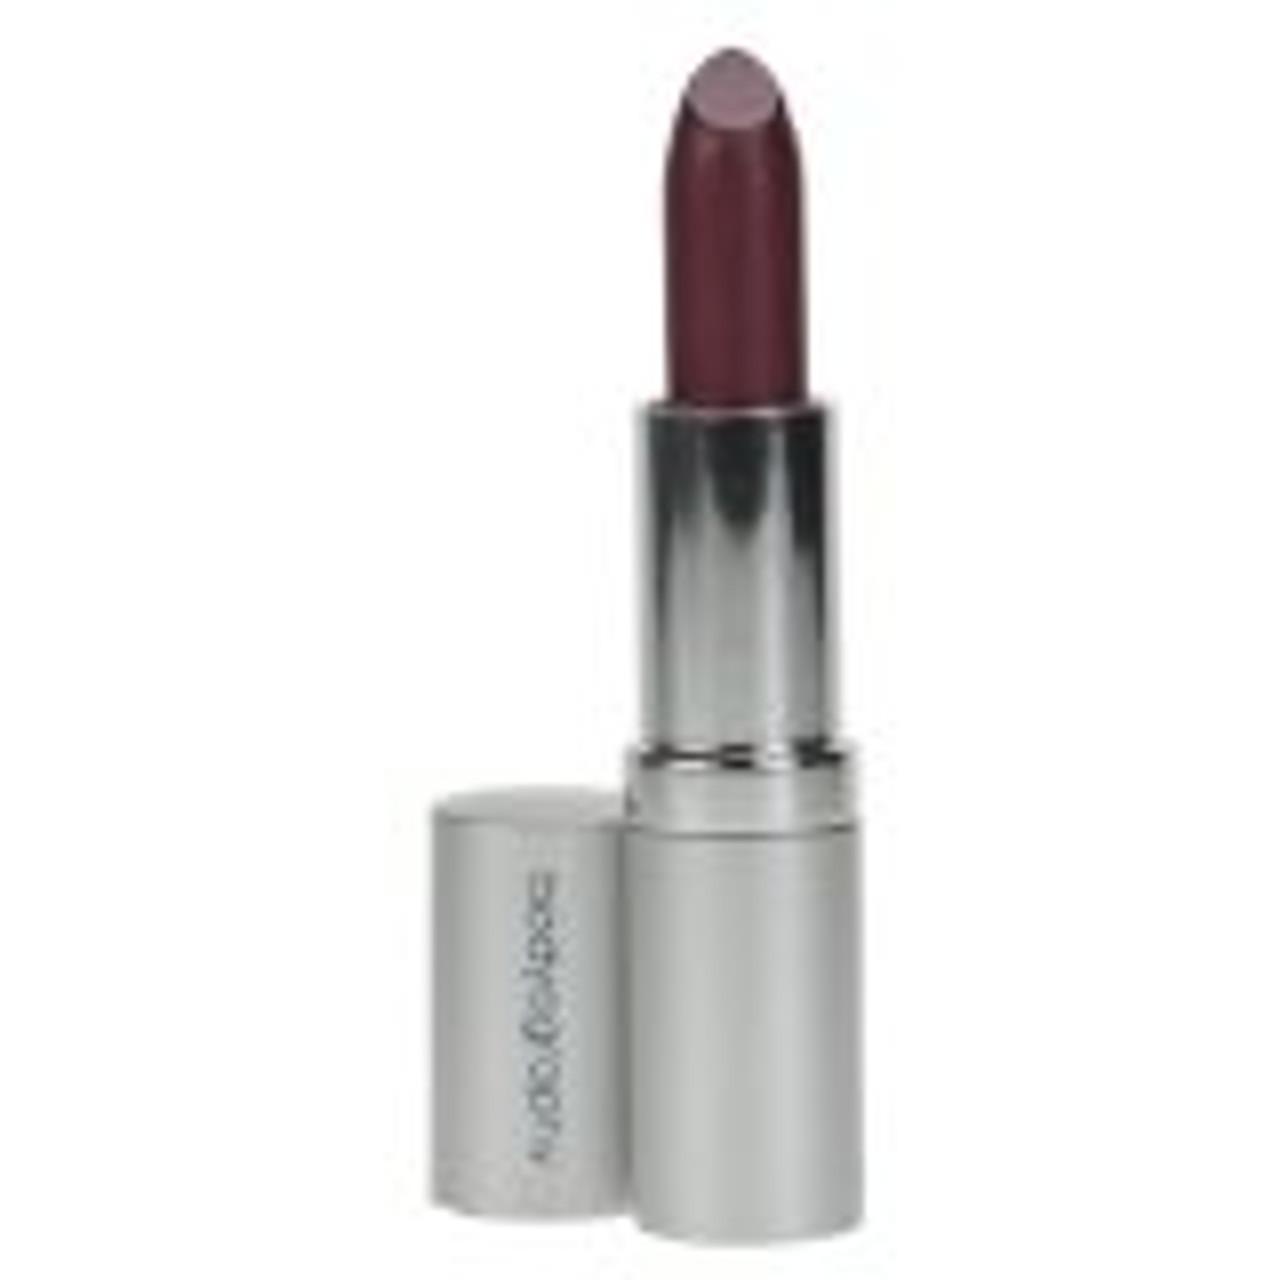 Bodyography Dawn Lipstick